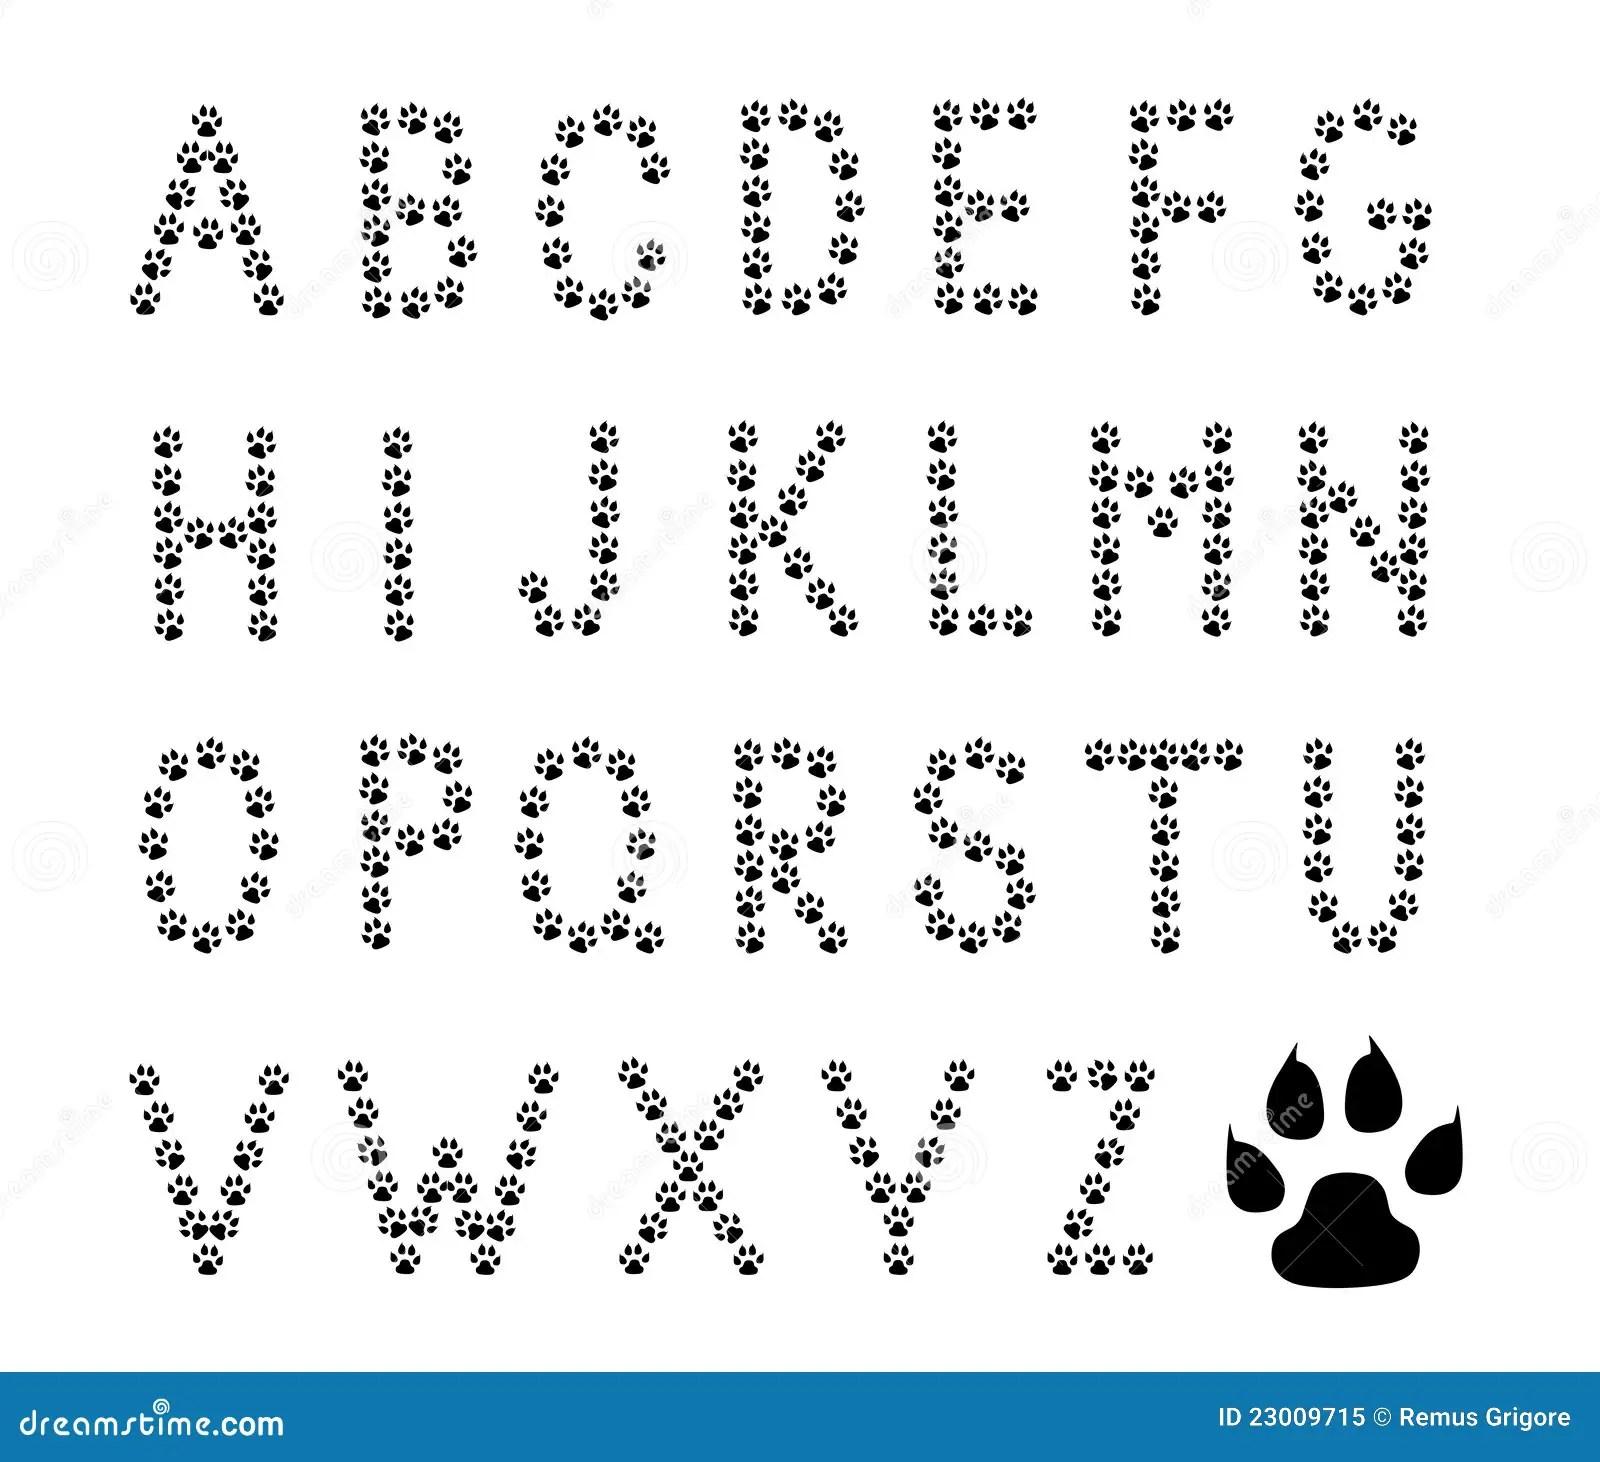 Paw Prints Alphabet